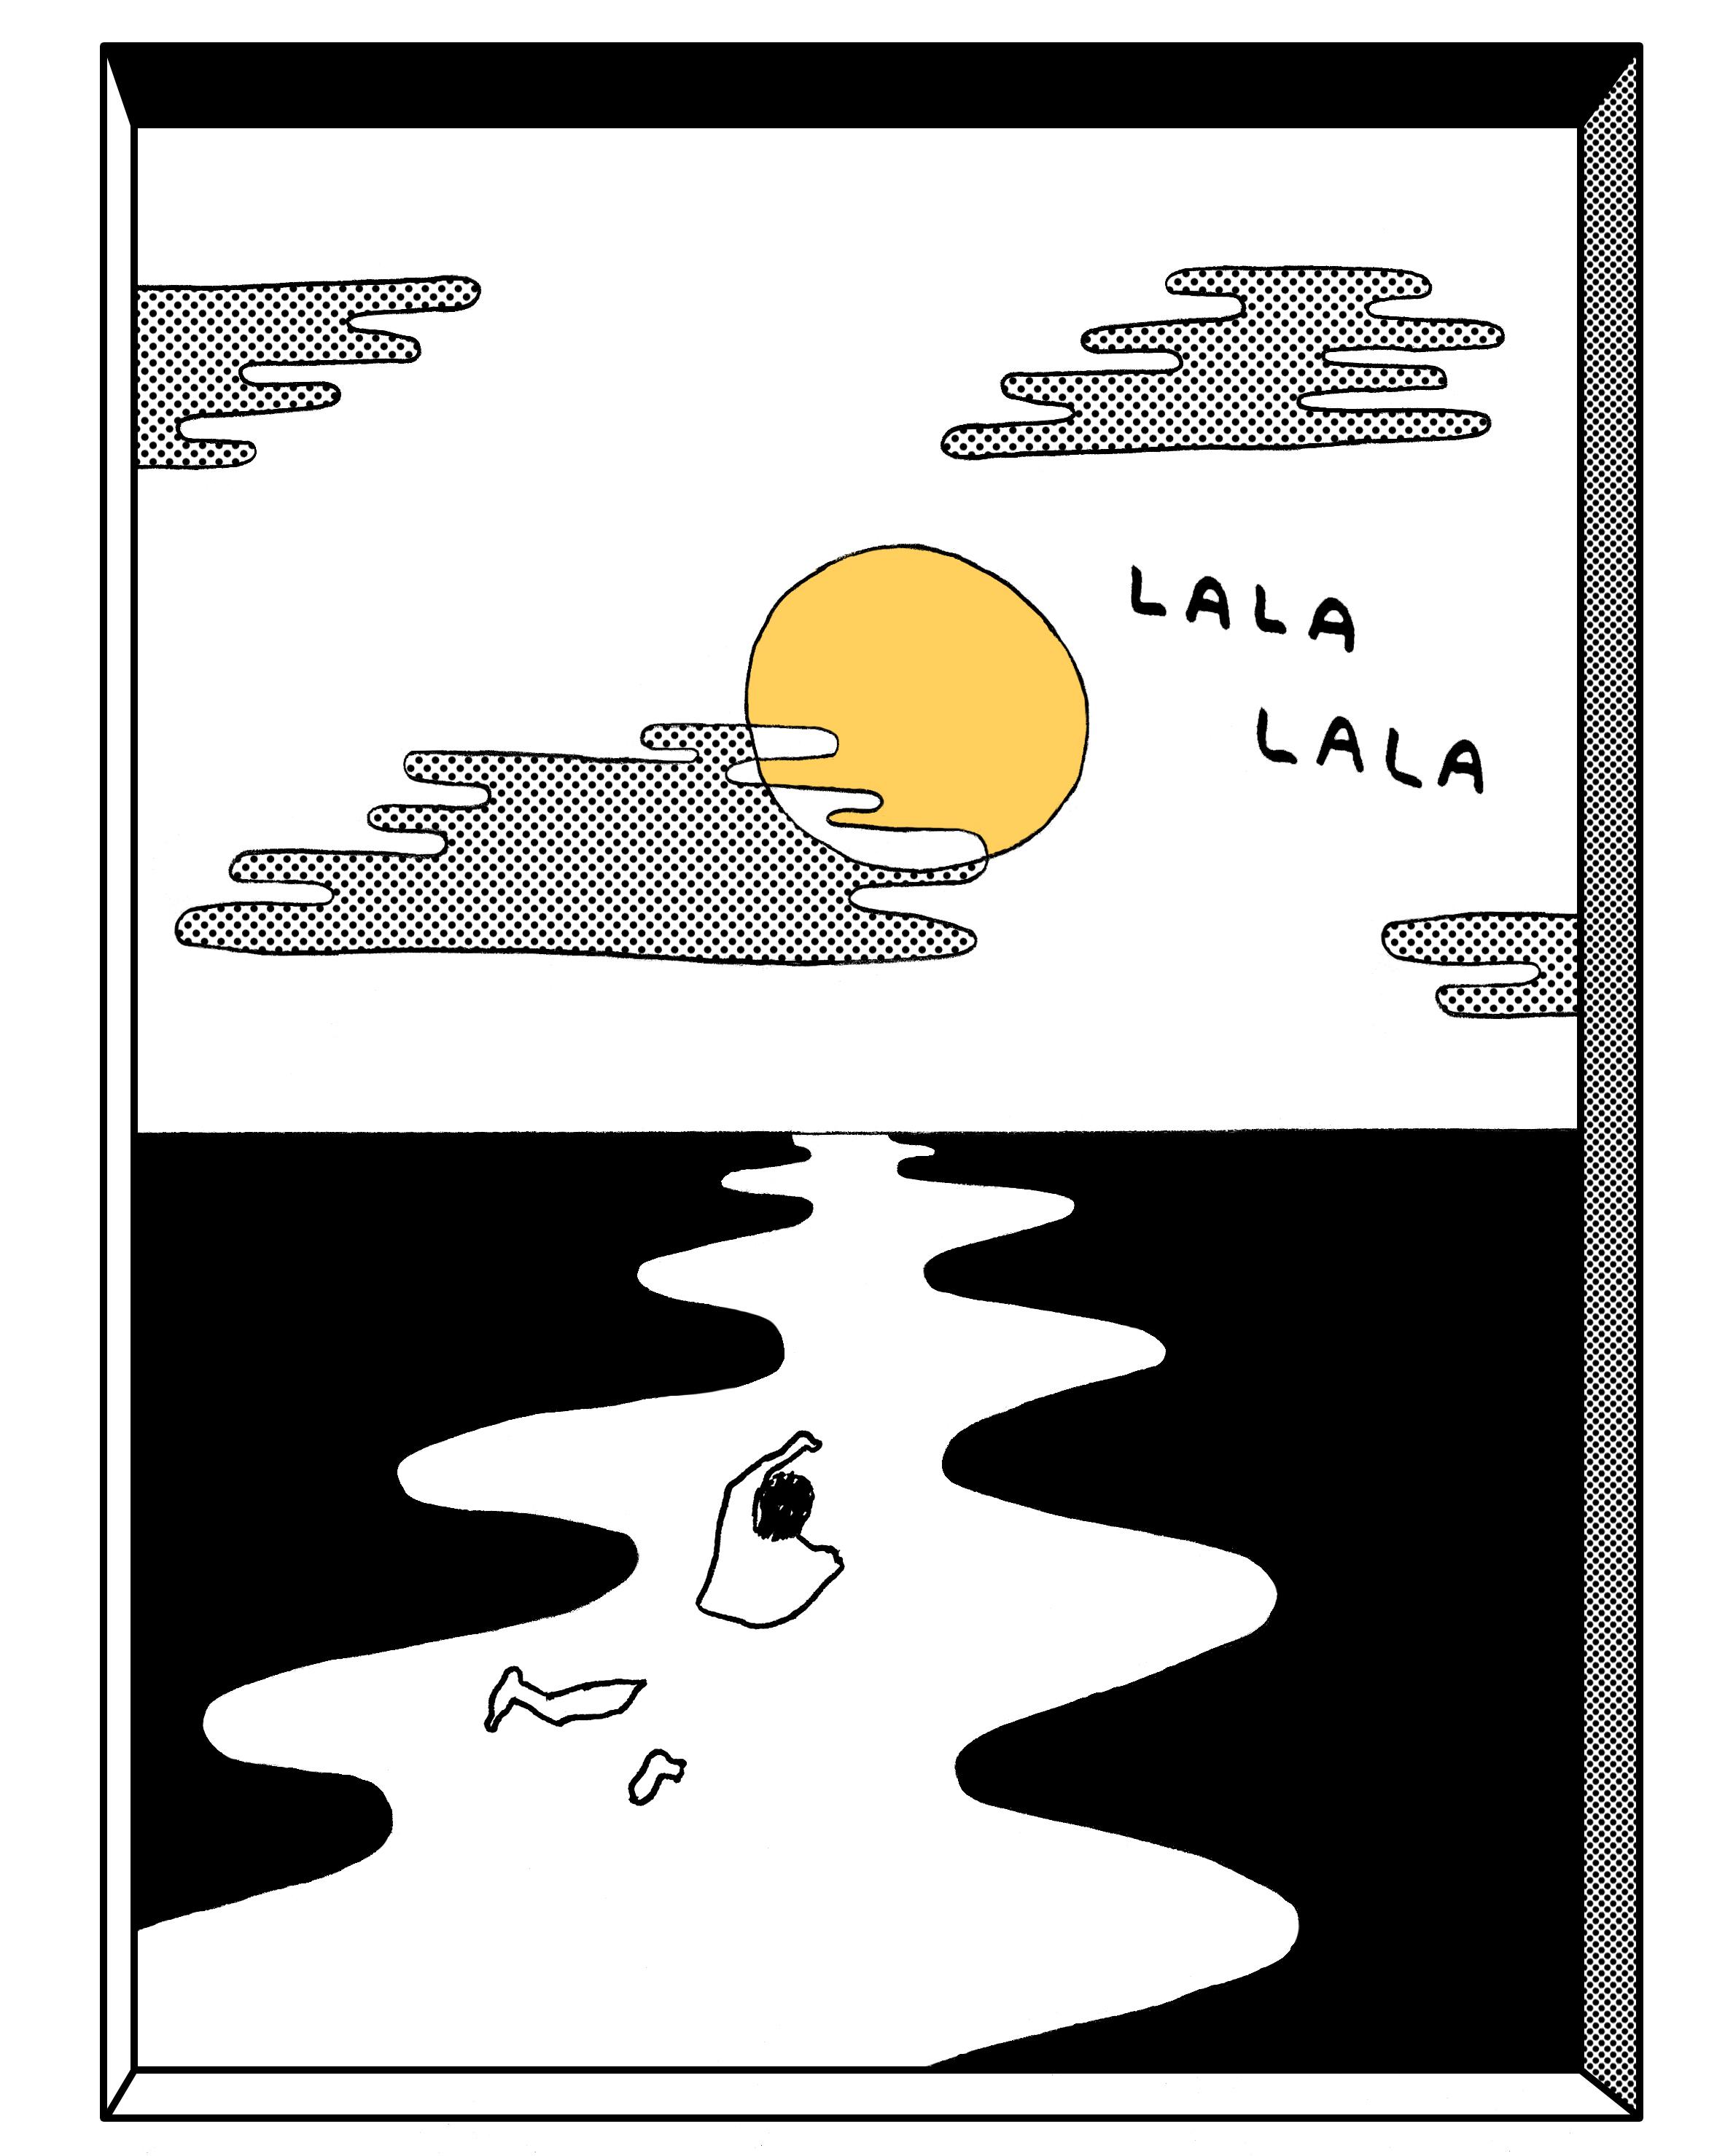 T-shirt for Lala Lala